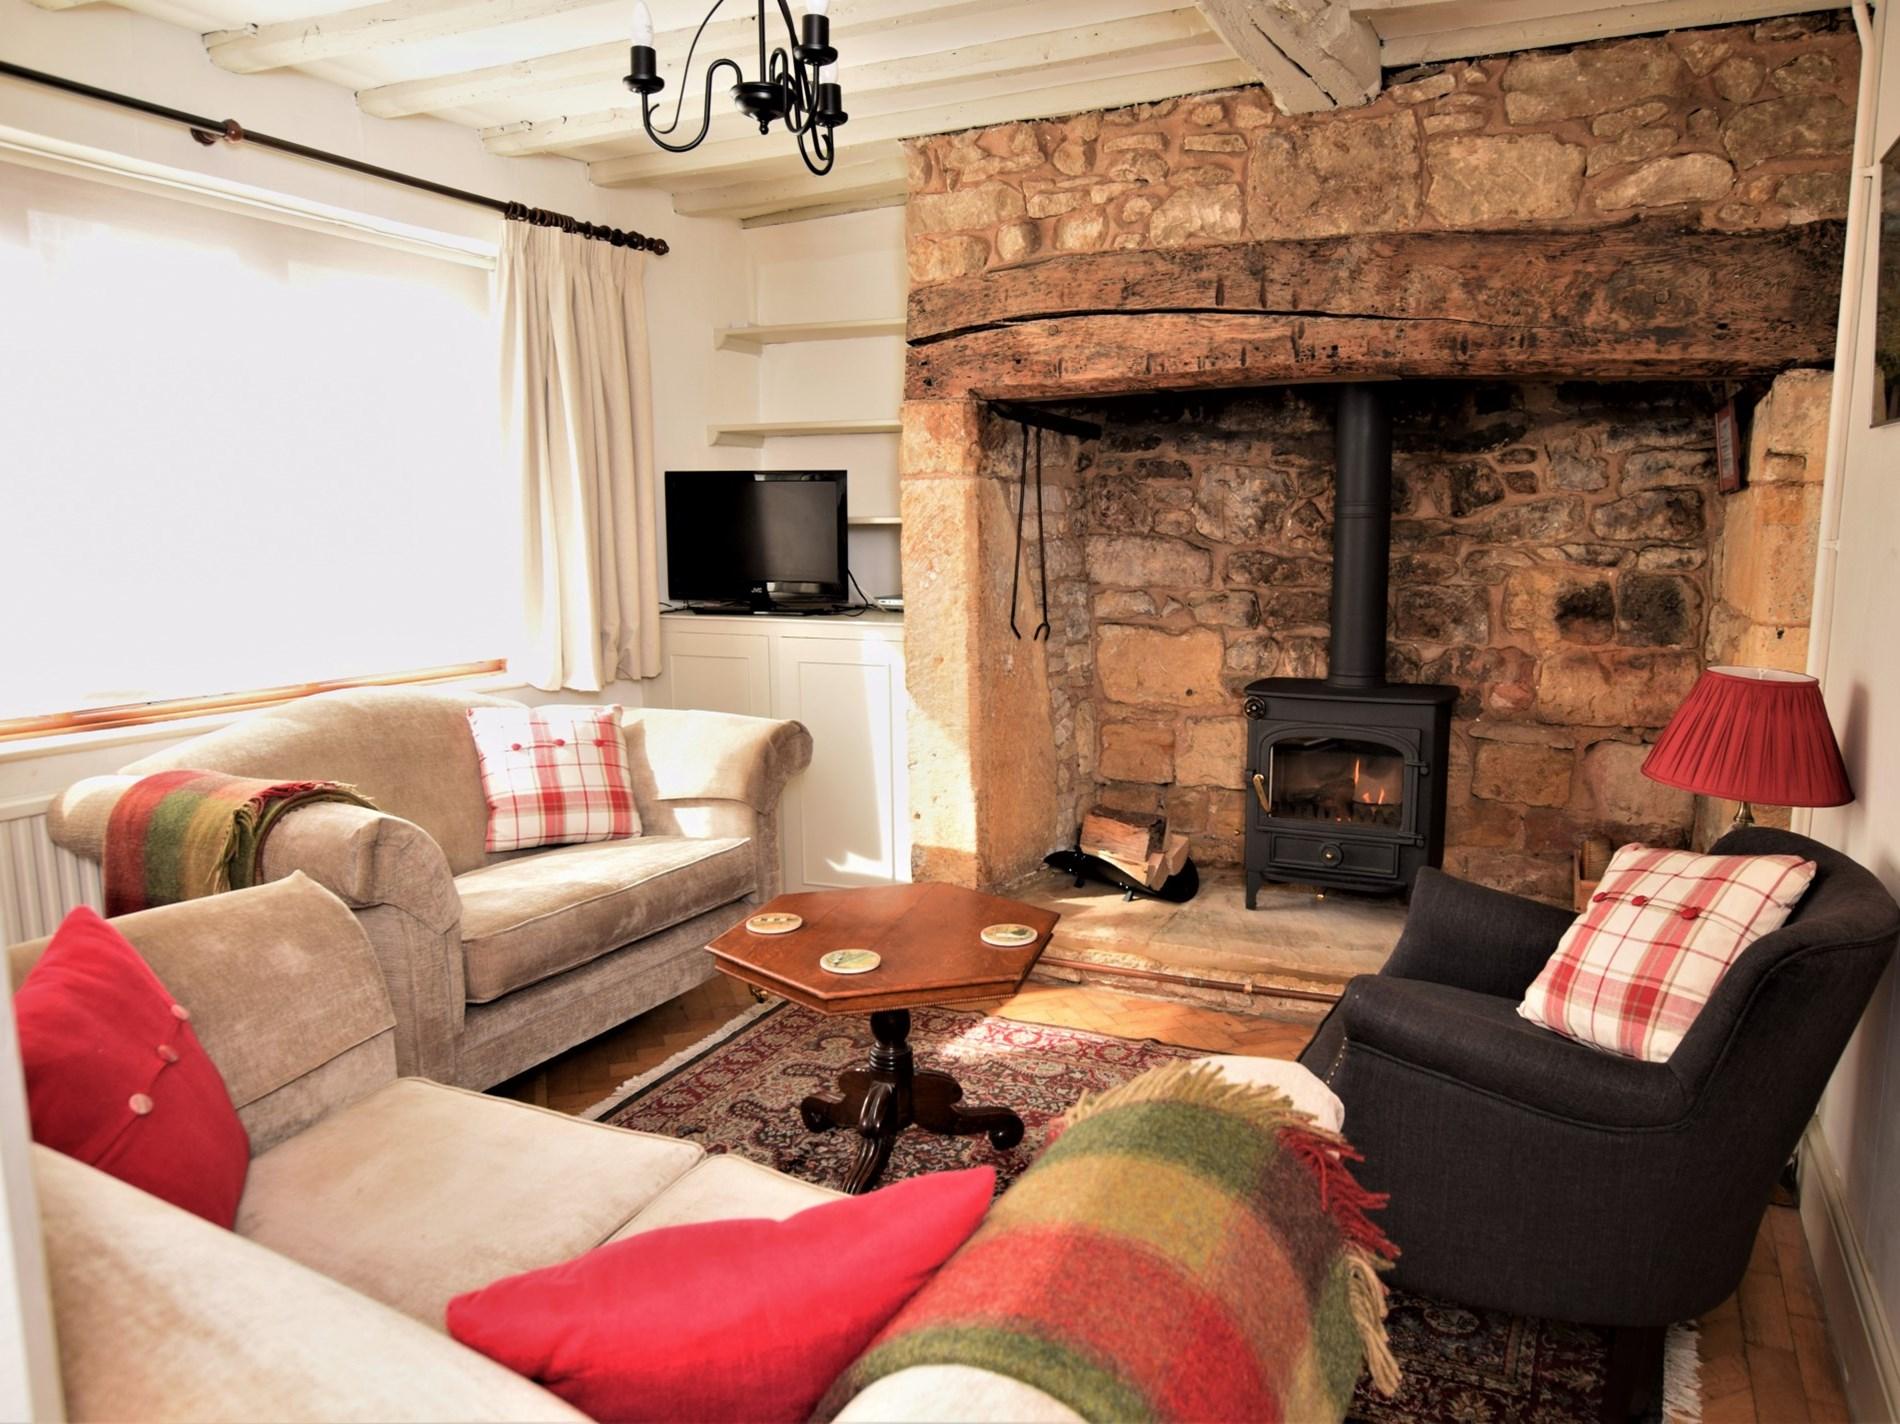 2 Bedroom Cottage in Cheltenham, Heart of England